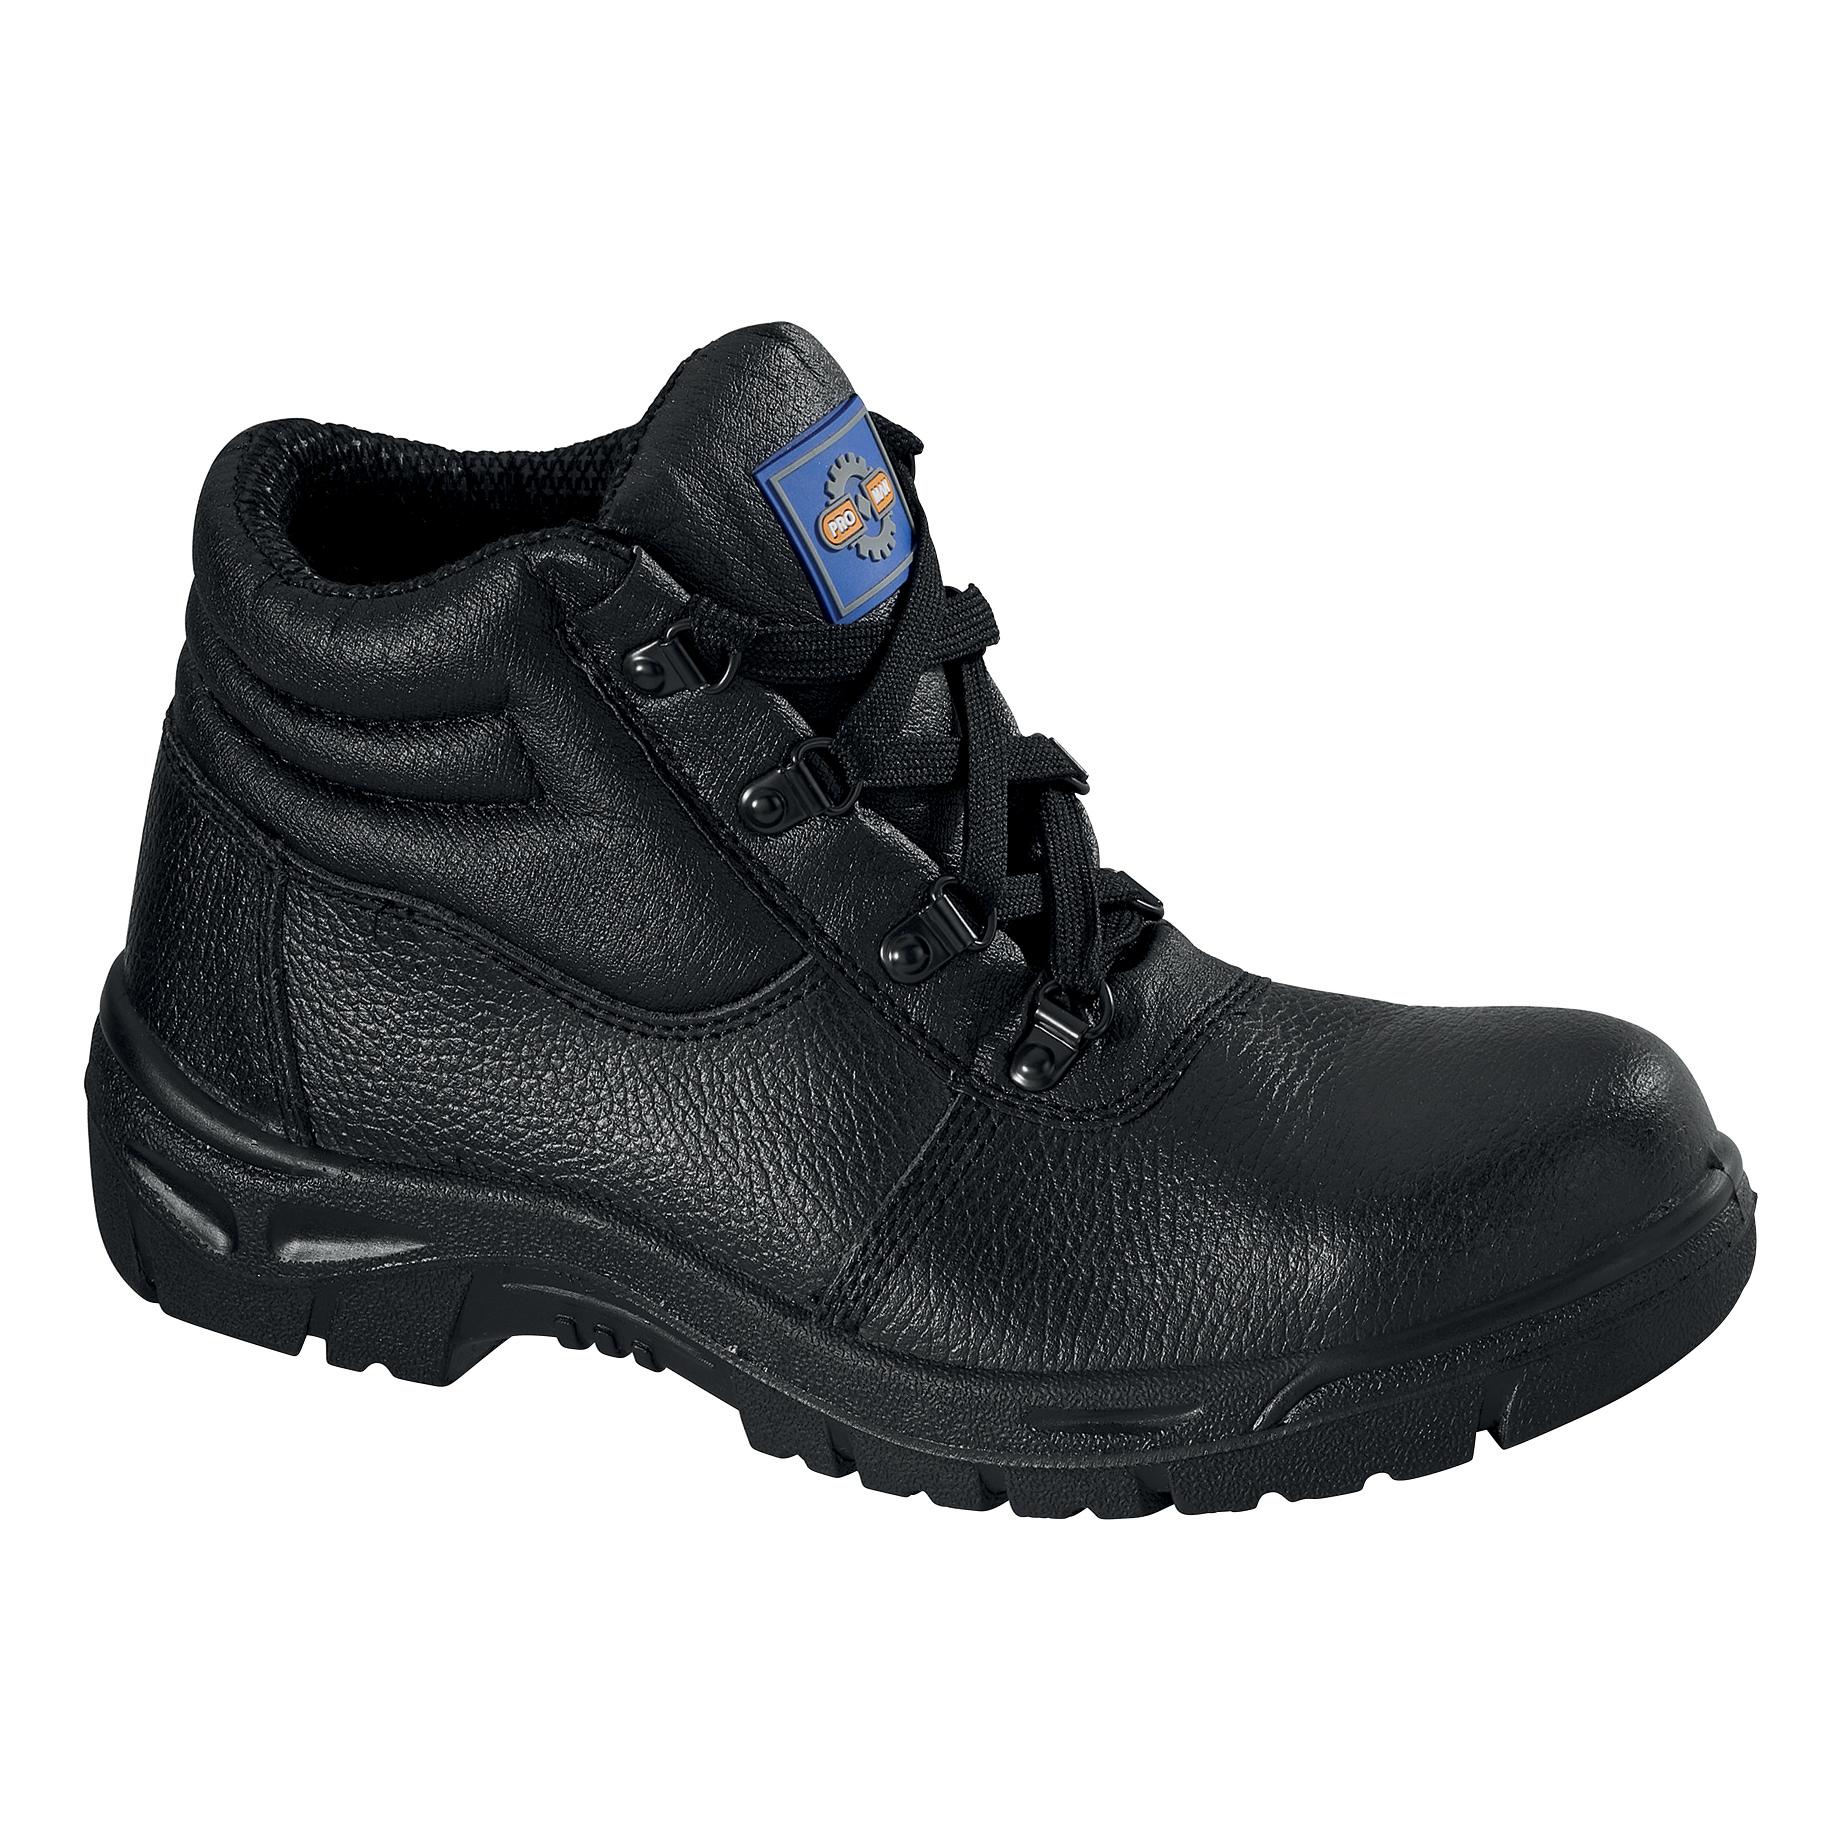 Chukka Boot Leather Steel Toecap & Midsole Size 8 Black Ref PM100 8